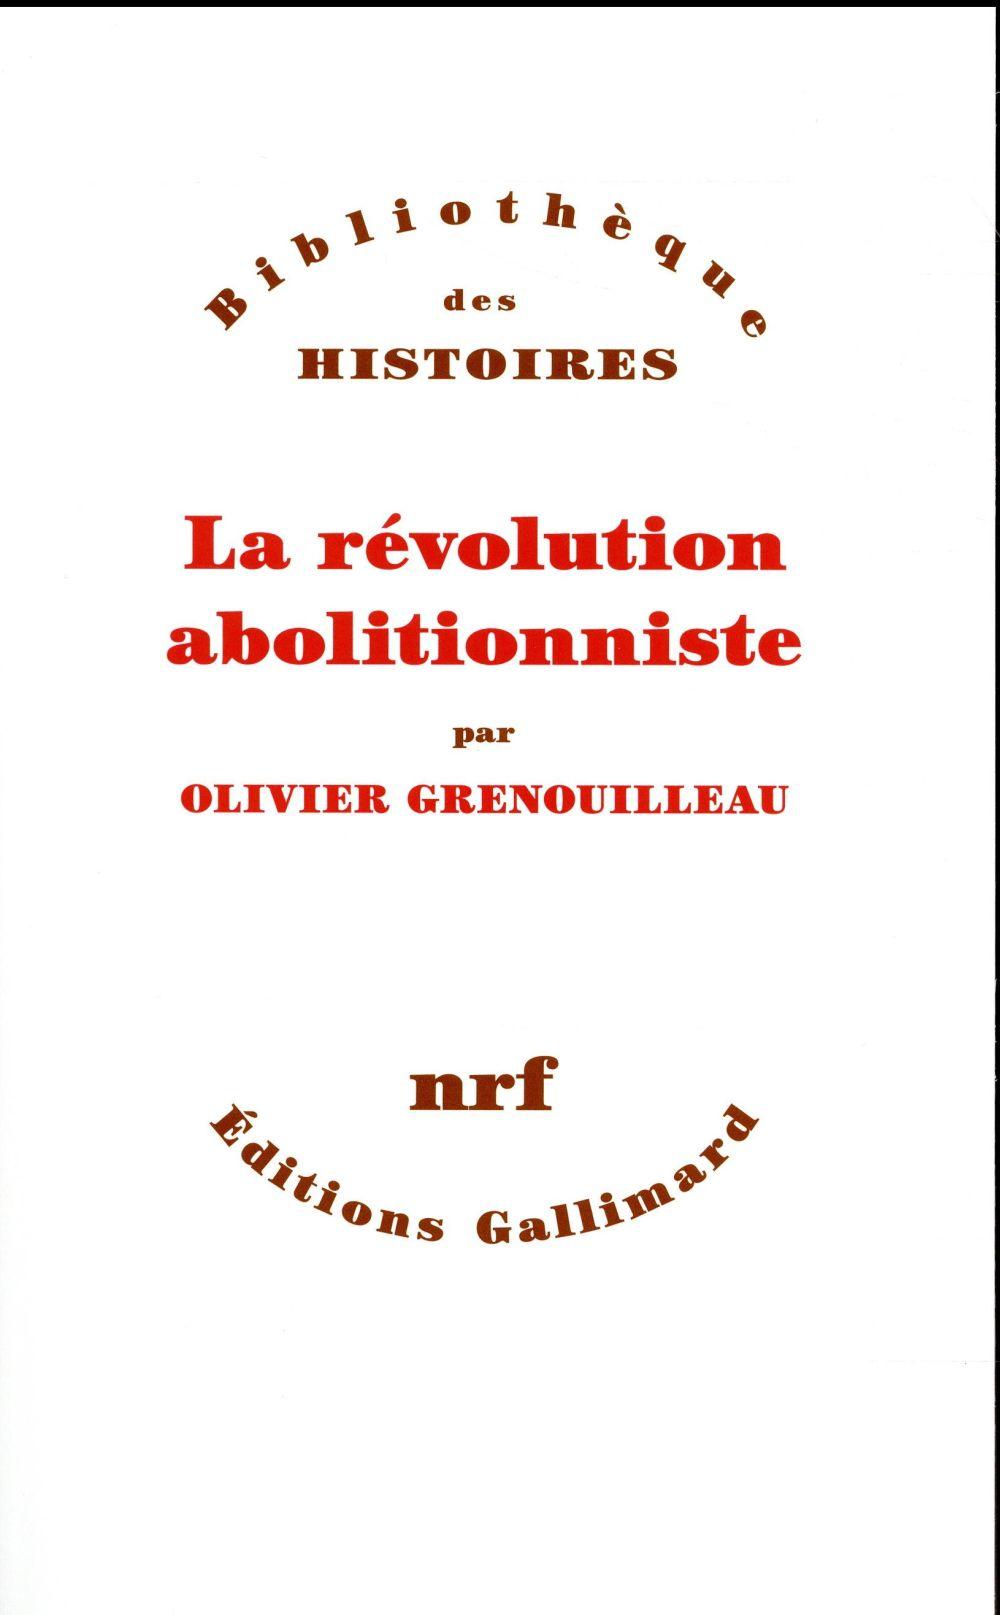 LA REVOLUTION ABOLITIONNISTE